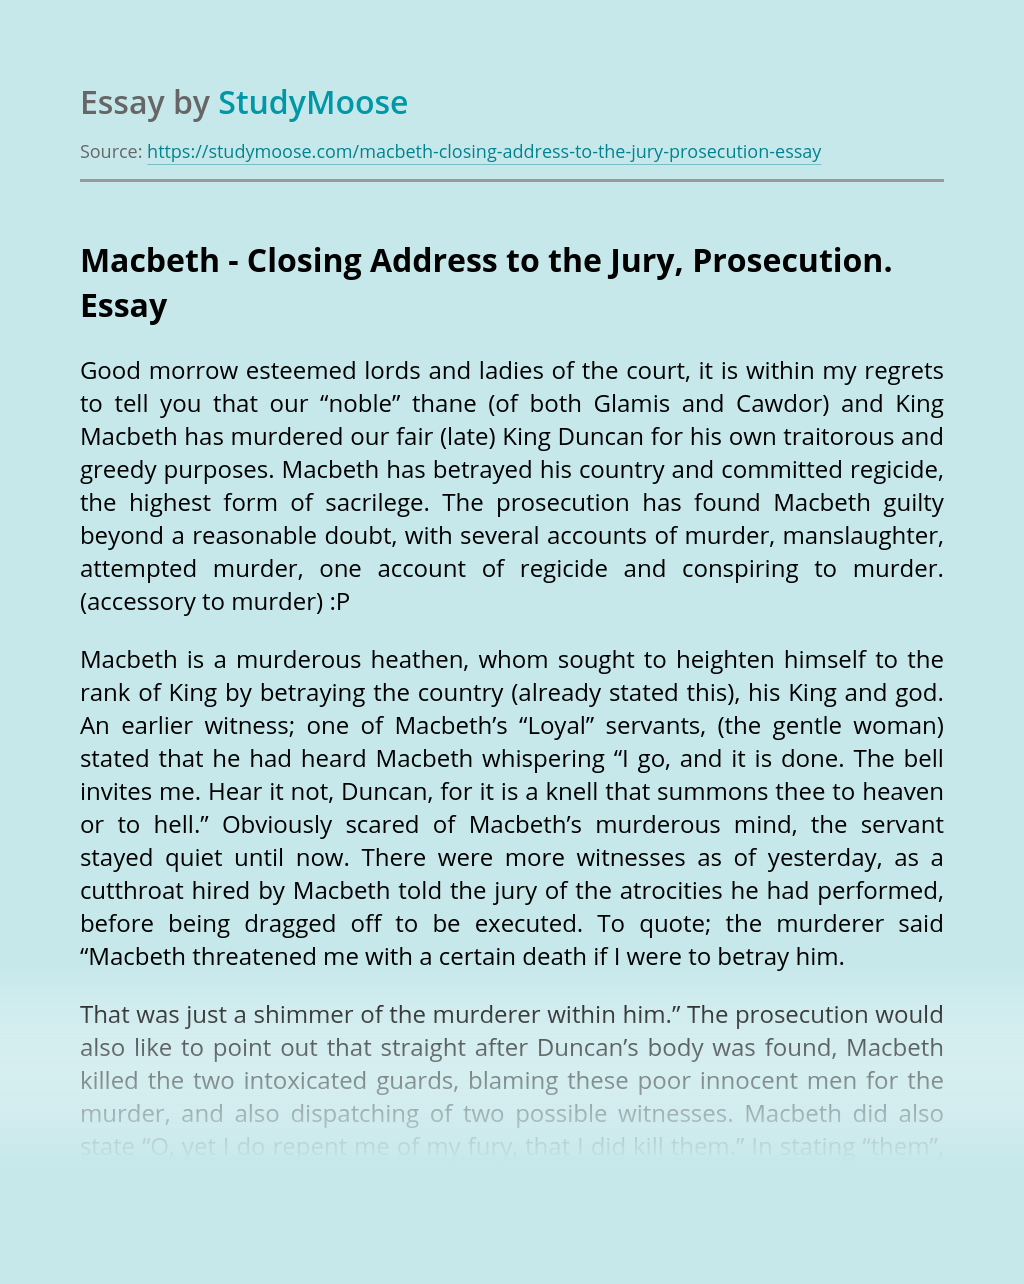 Macbeth – Closing Address to the Jury, Prosecution.